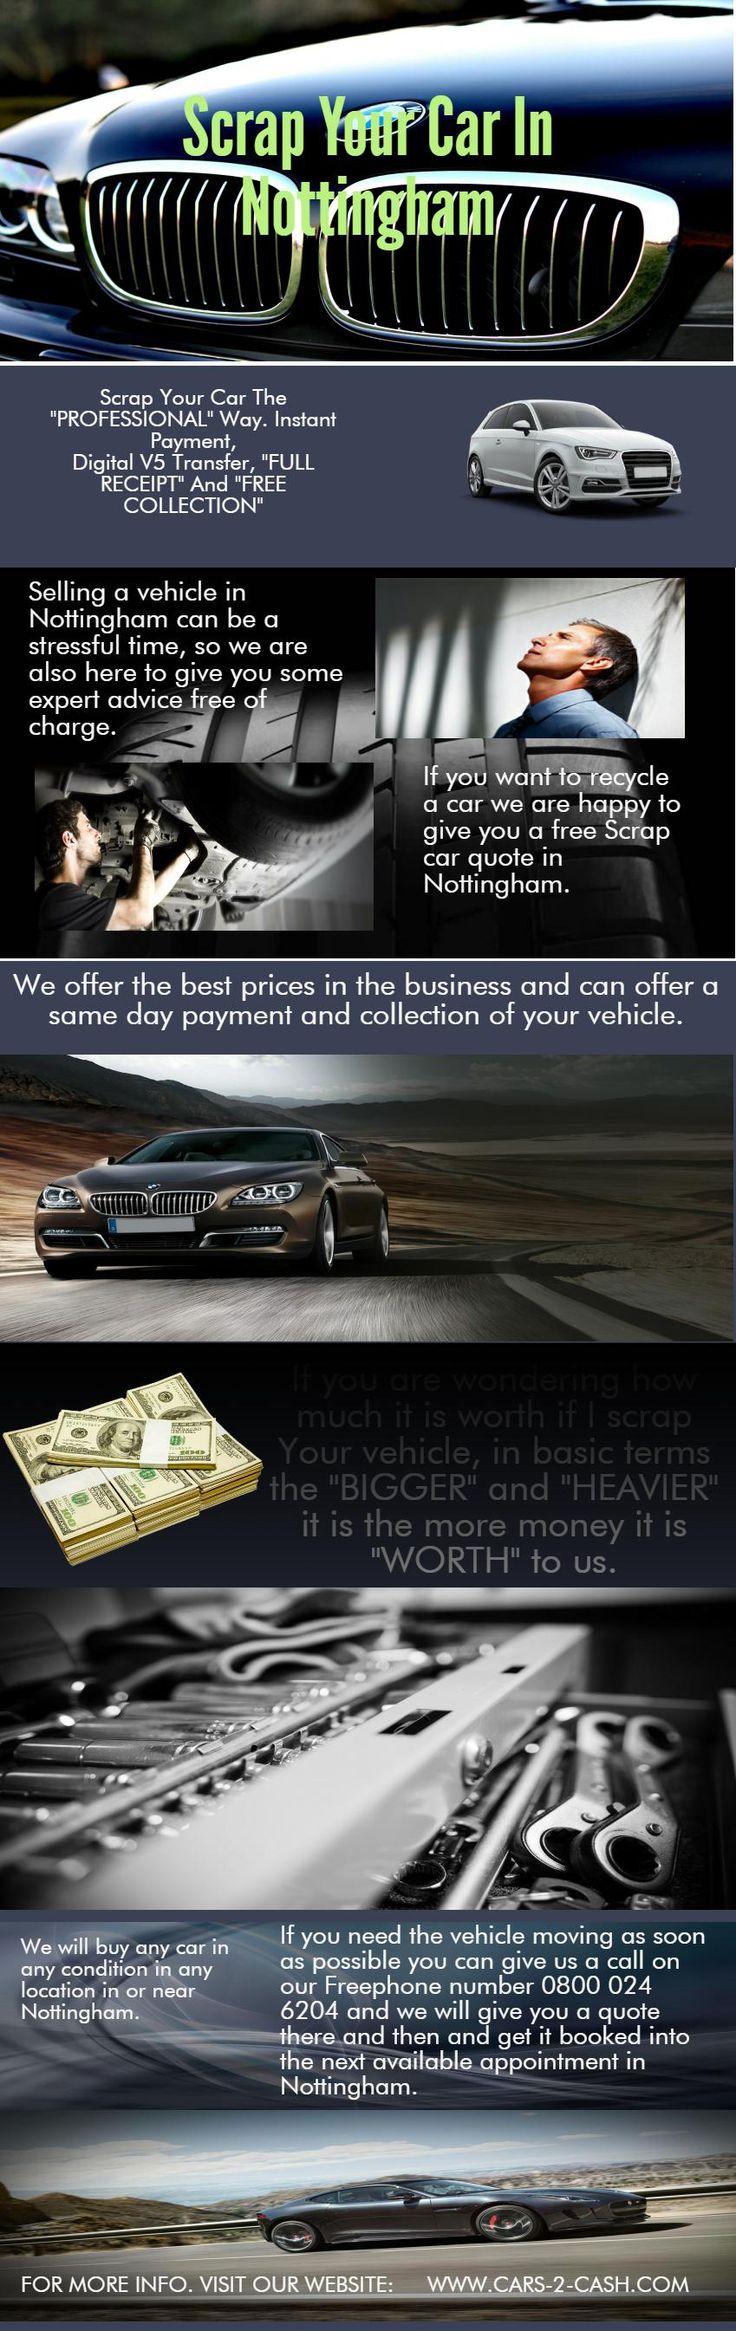 Best 25+ Scrap car ideas on Pinterest   Car scrap value, Long sew ...